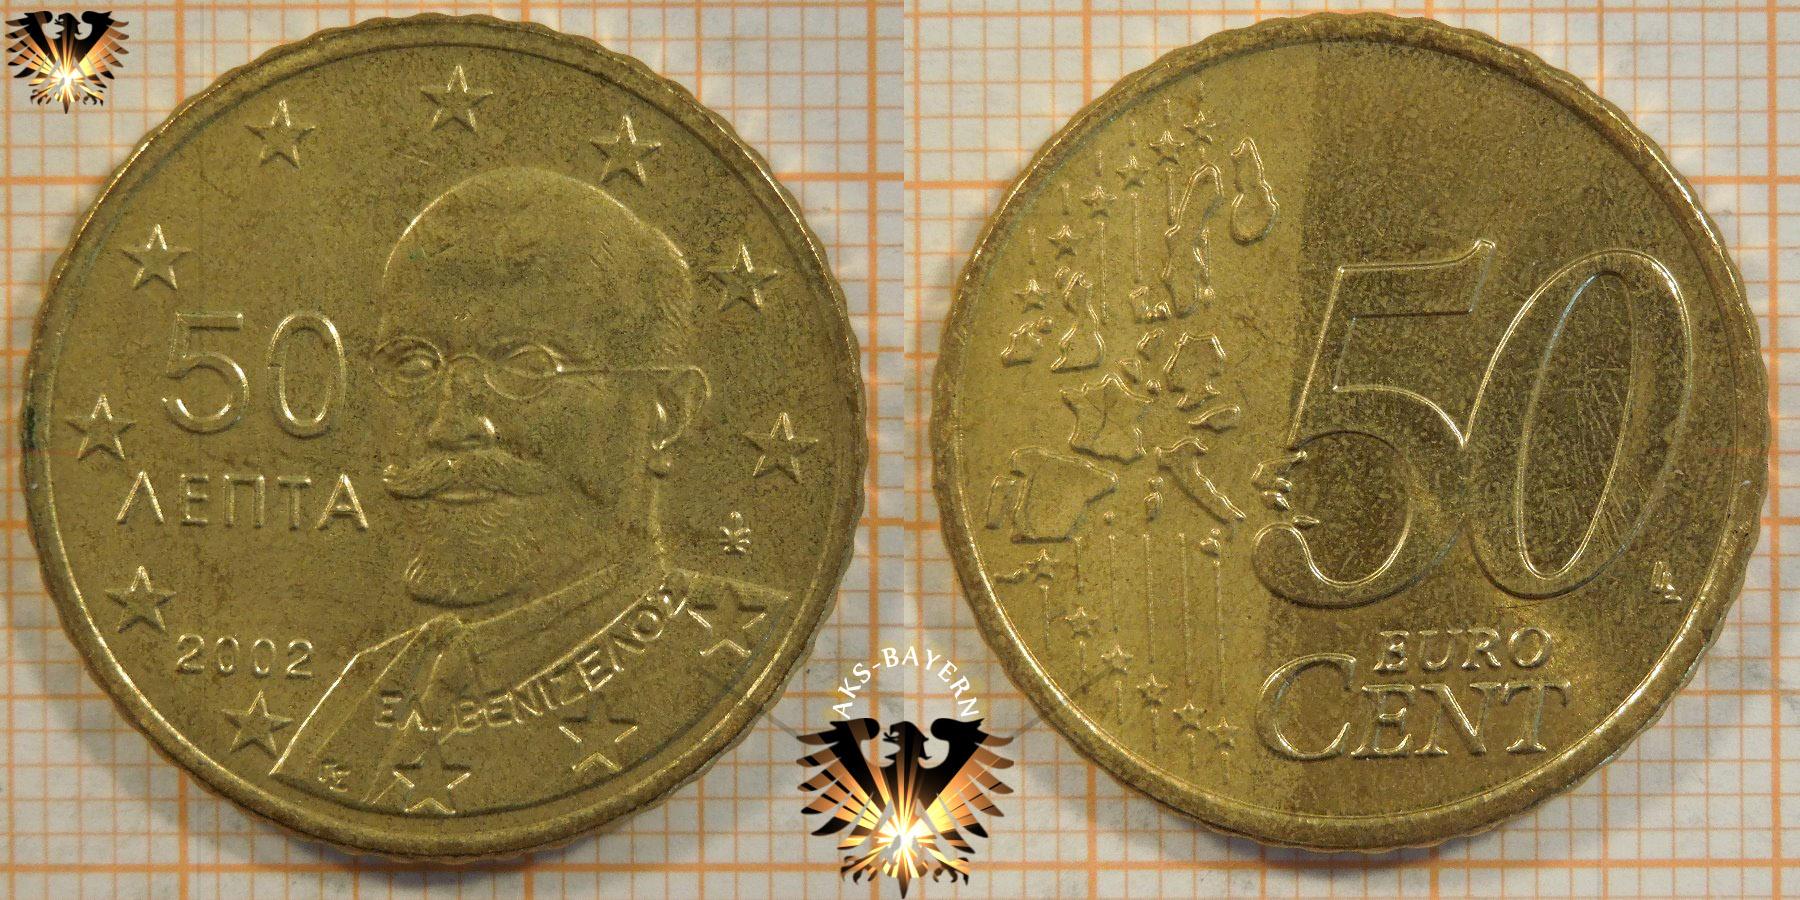 50 Euro Cent Griechenland 2002 Nominal